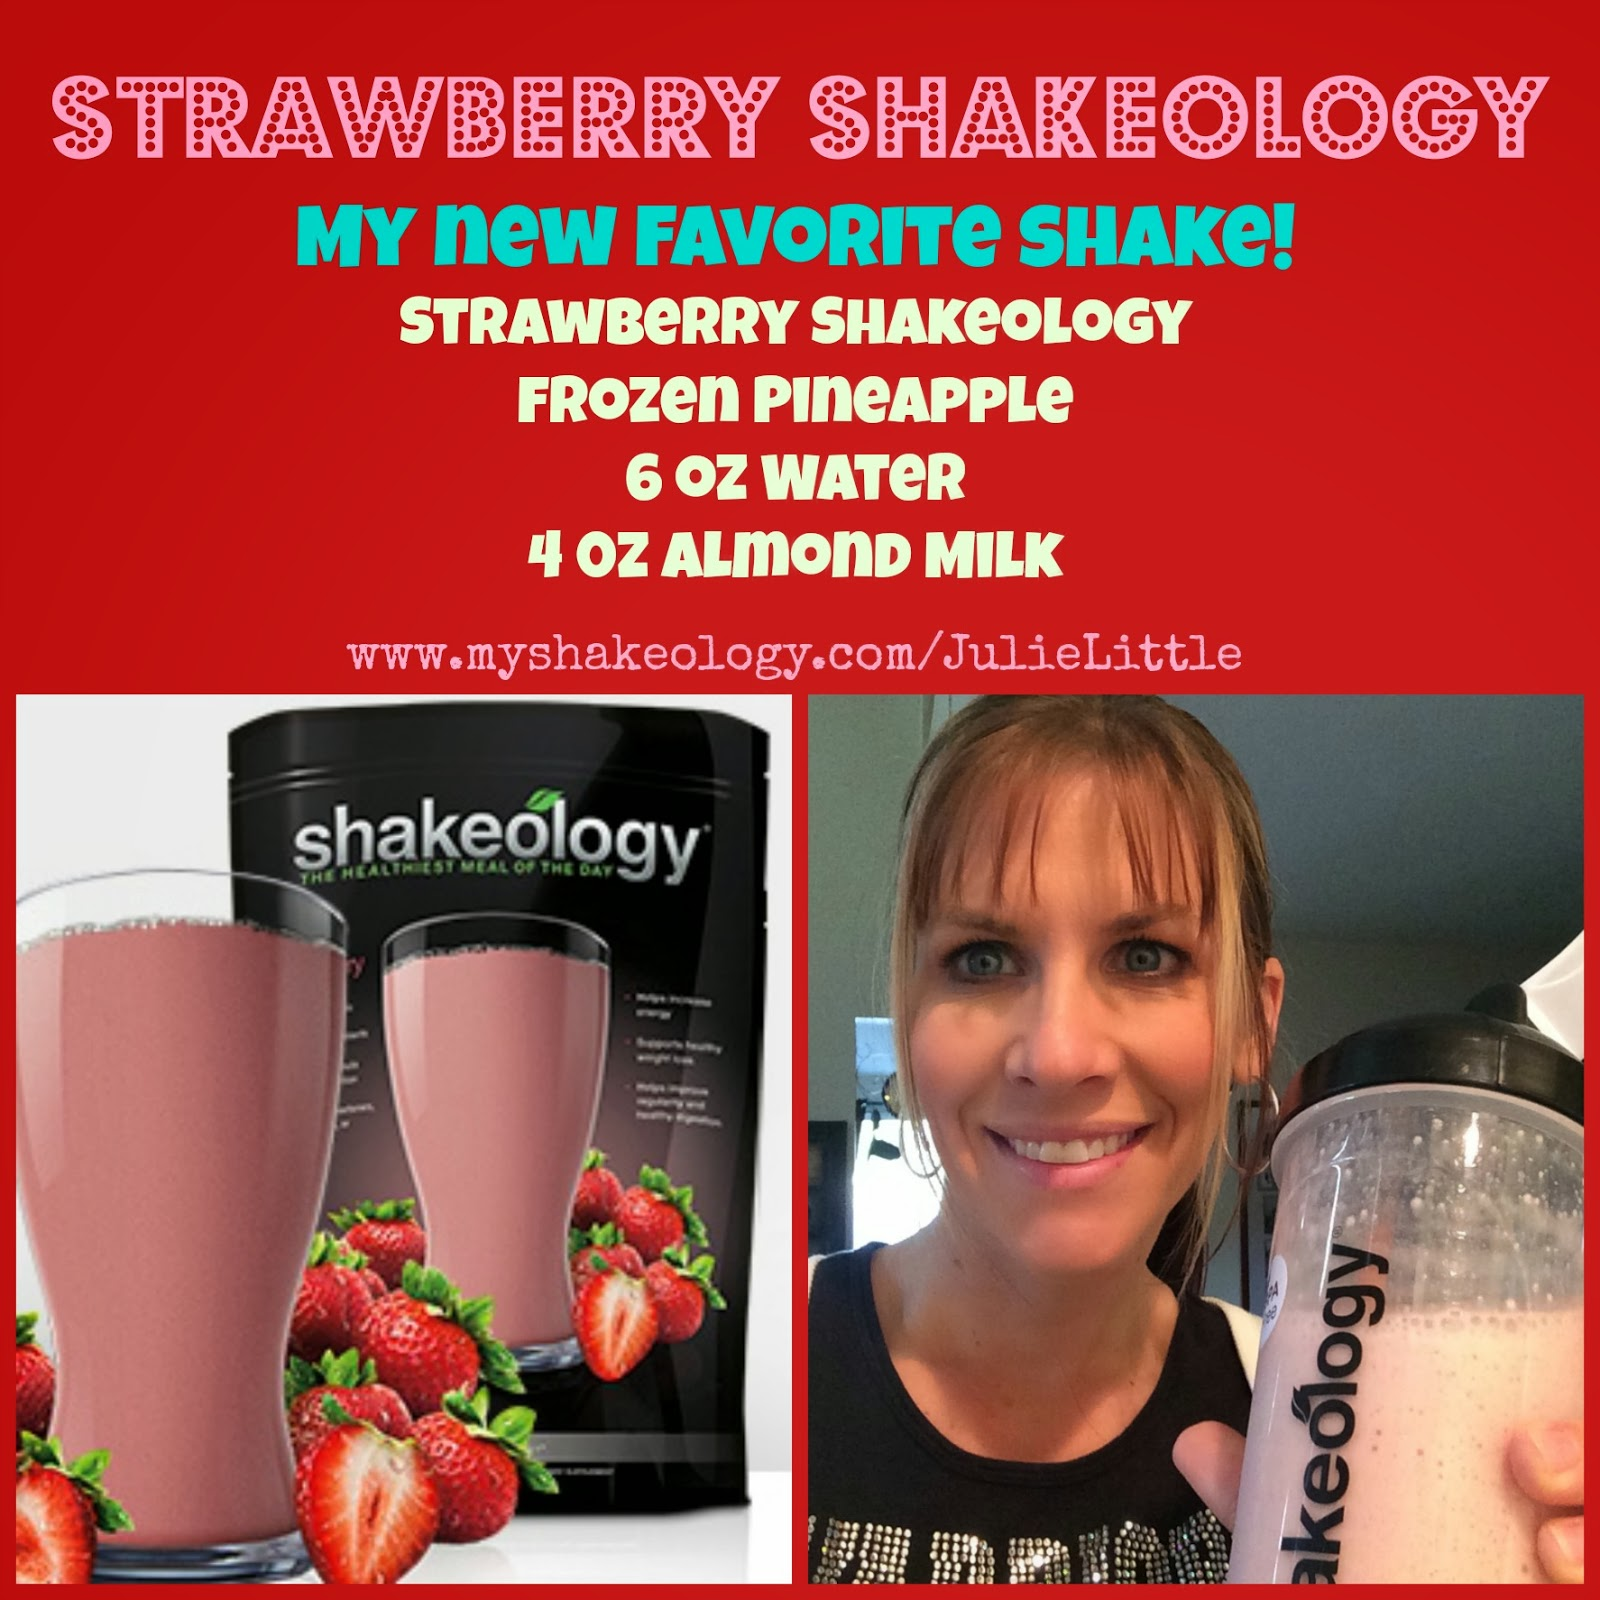 Strawberry Pineapple Shakeology, www.HealthyFitFocused.com